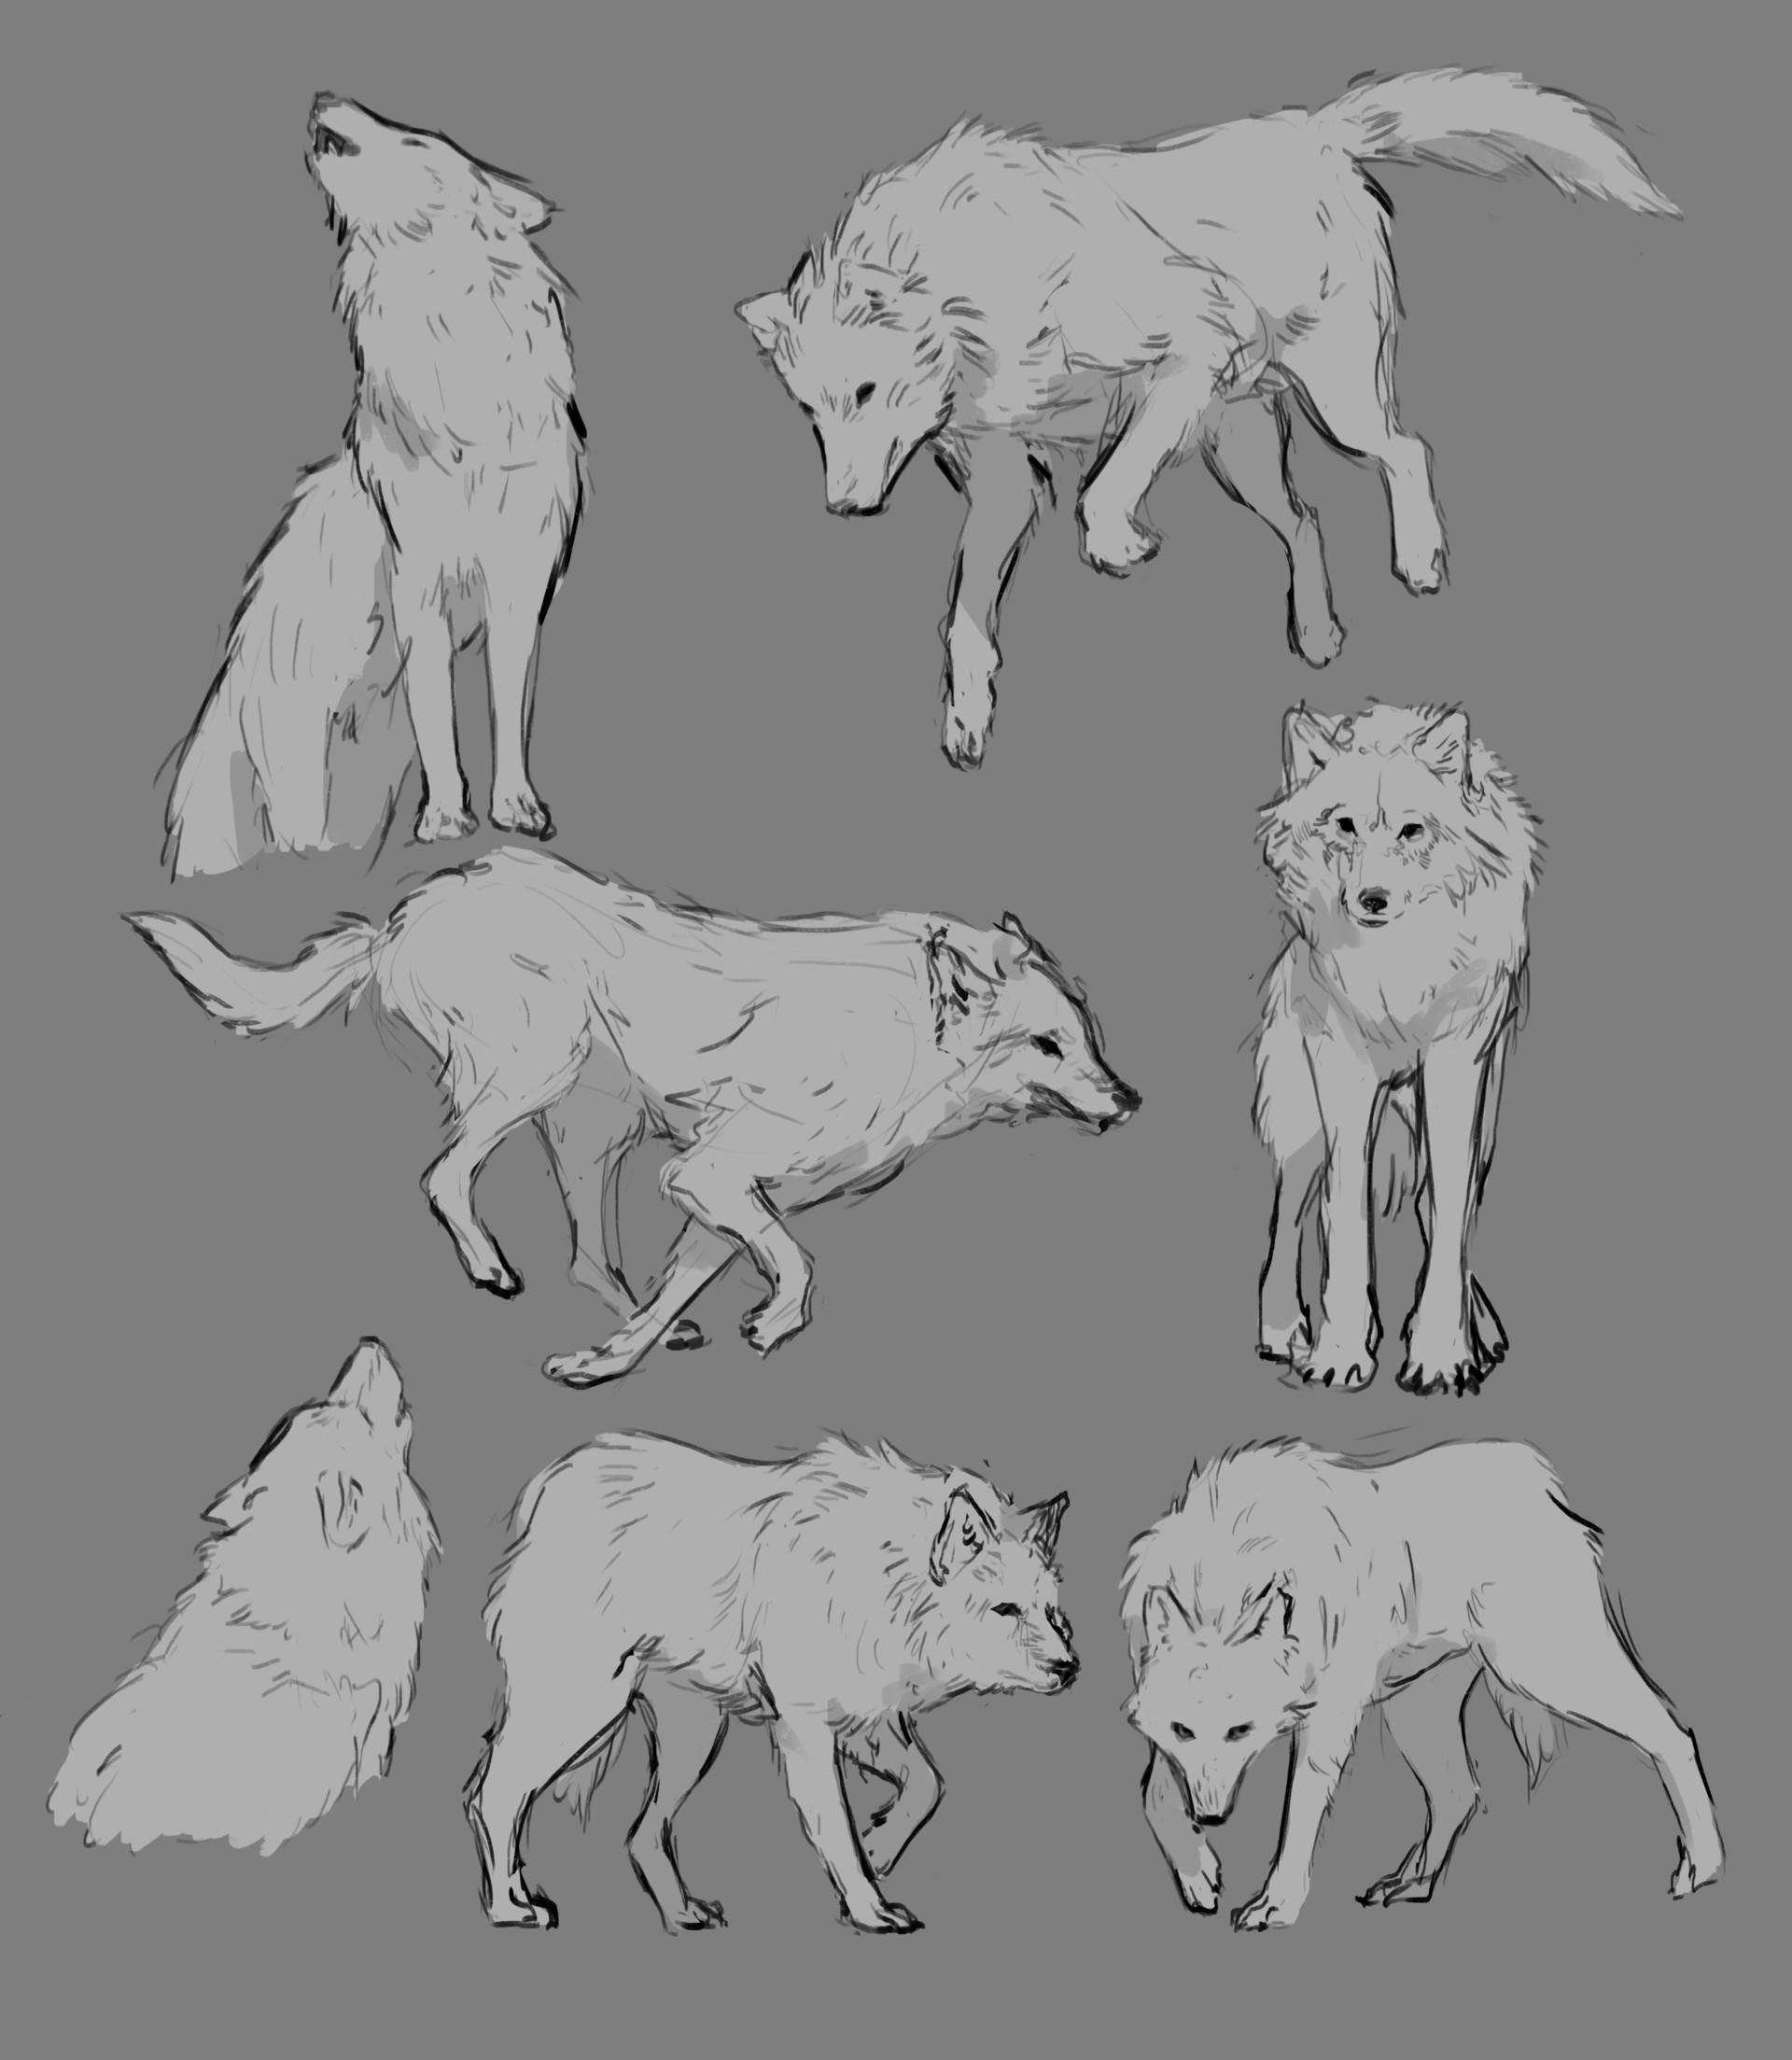 Dani kruse direwolfstudies